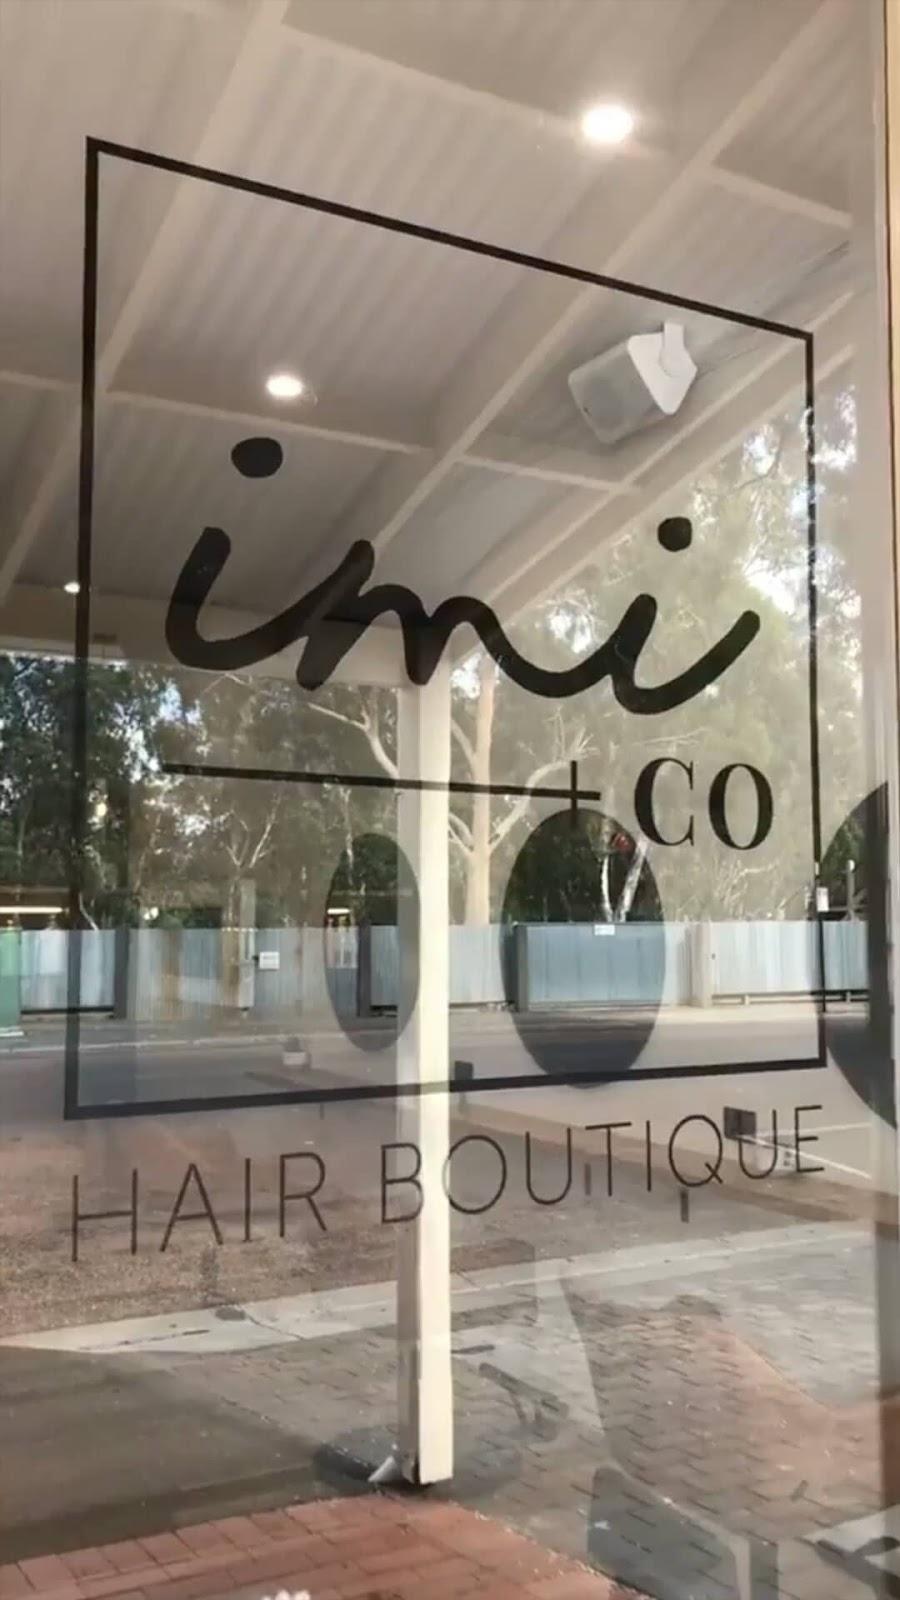 imi & co | hair care | 33 Murray Esplanade, Echuca VIC 3564, Australia | 0434221984 OR +61 434 221 984